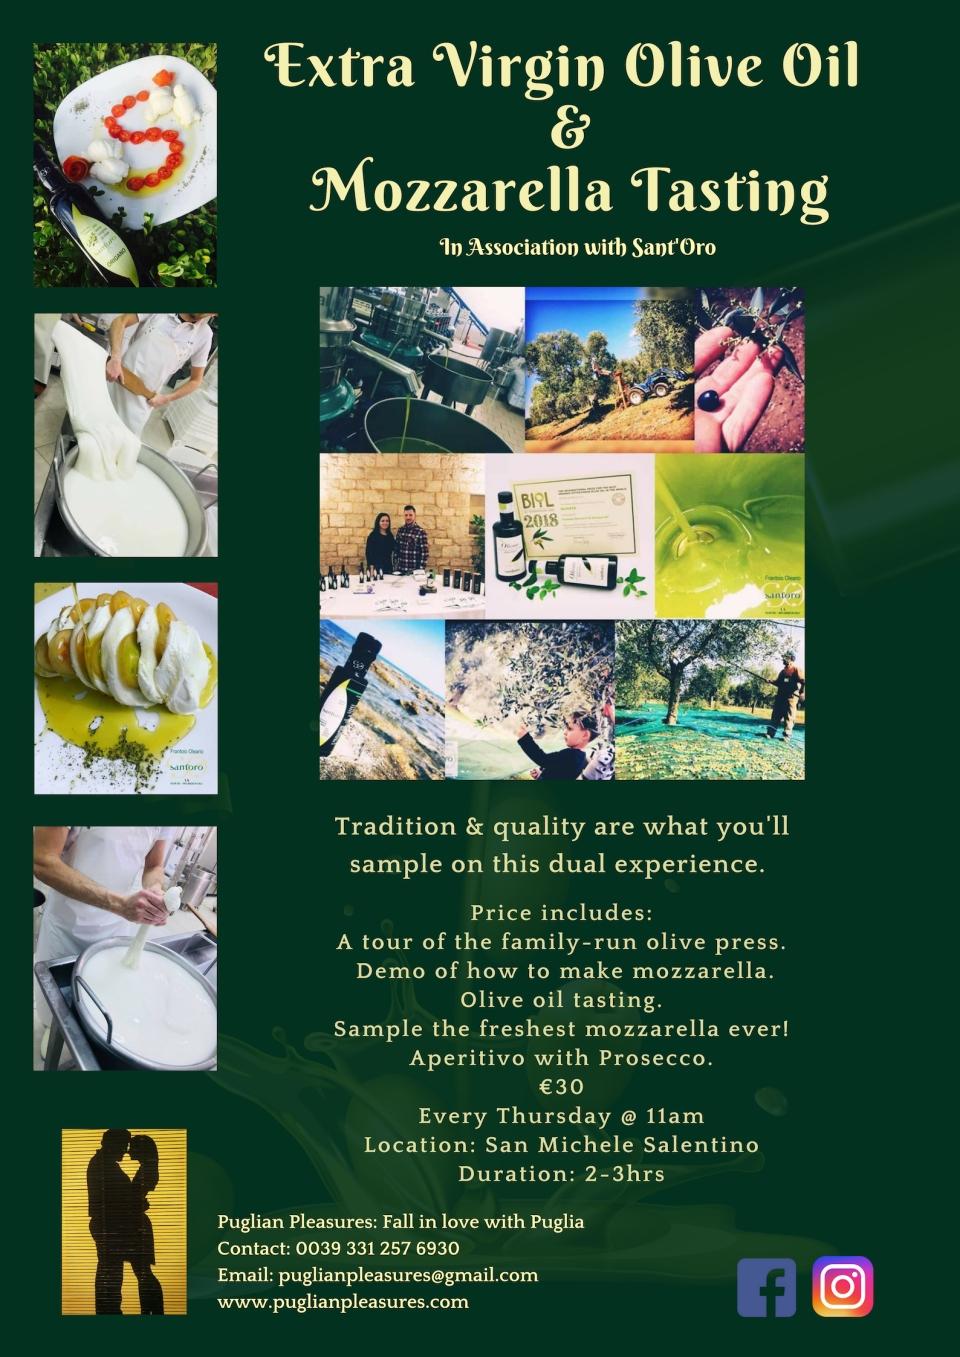 Olive Oil & Mozzarella Tasting | Puglian Pleasures